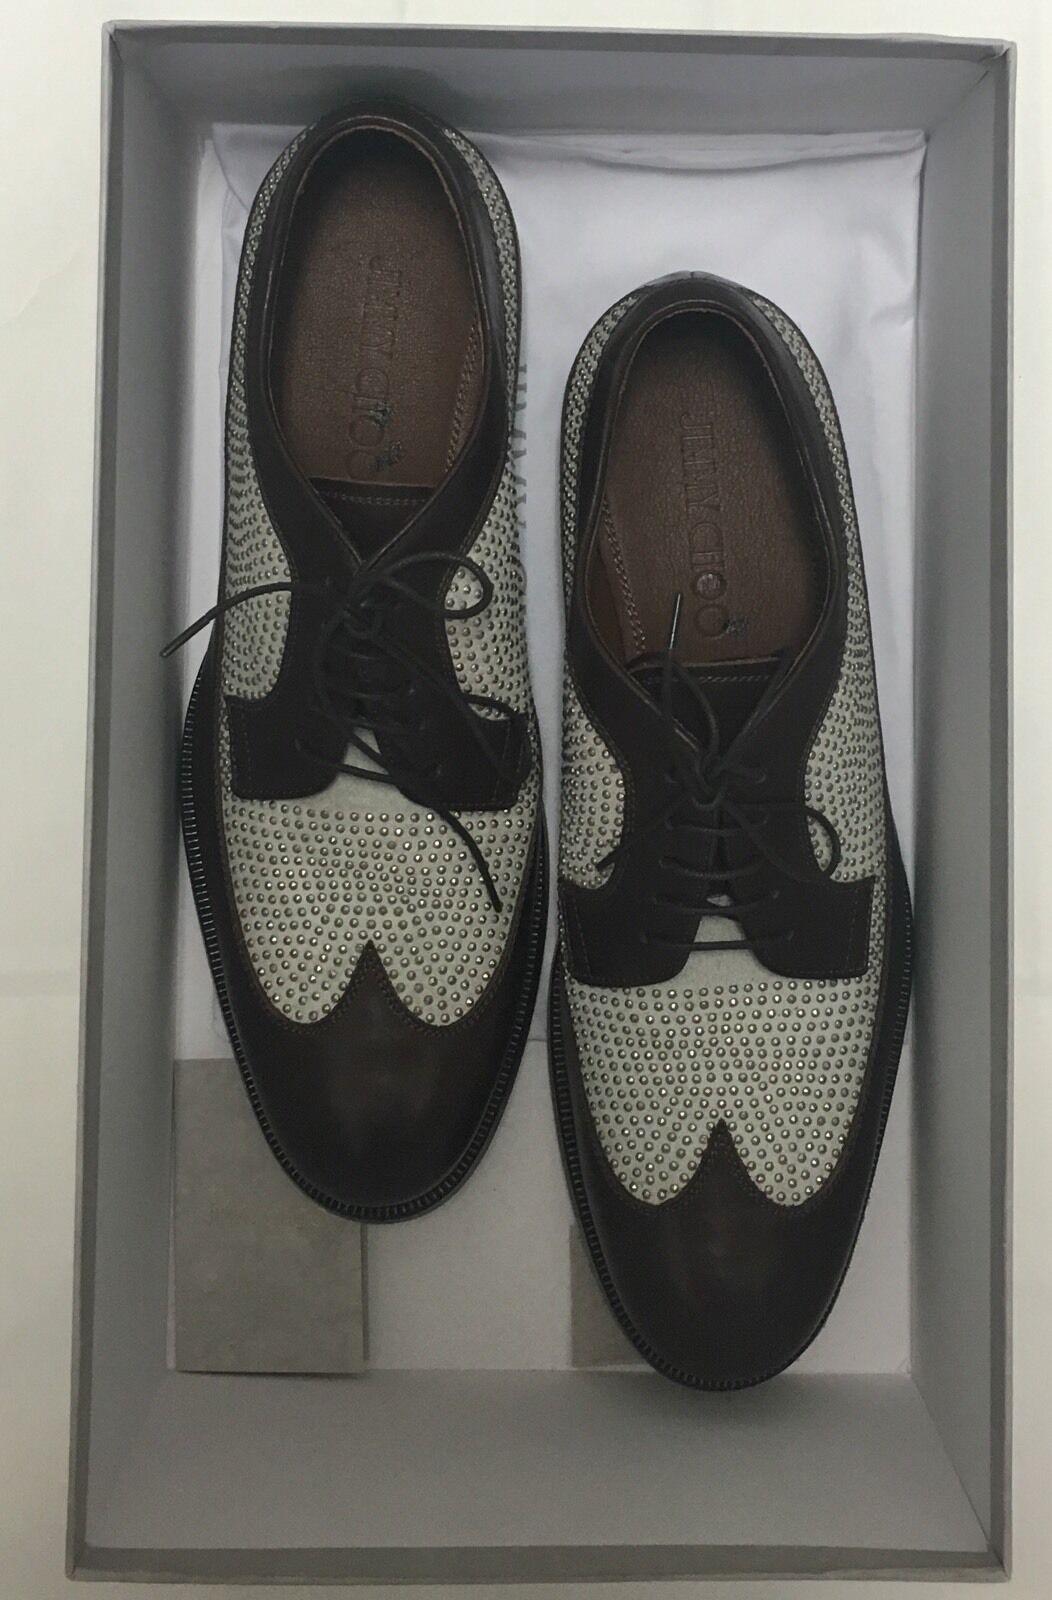 NIB Jimmy Choo Marronee Morland ha studiato Lace Up Leather  Oxfords scarpe Sz 41.5 EU  acquista online